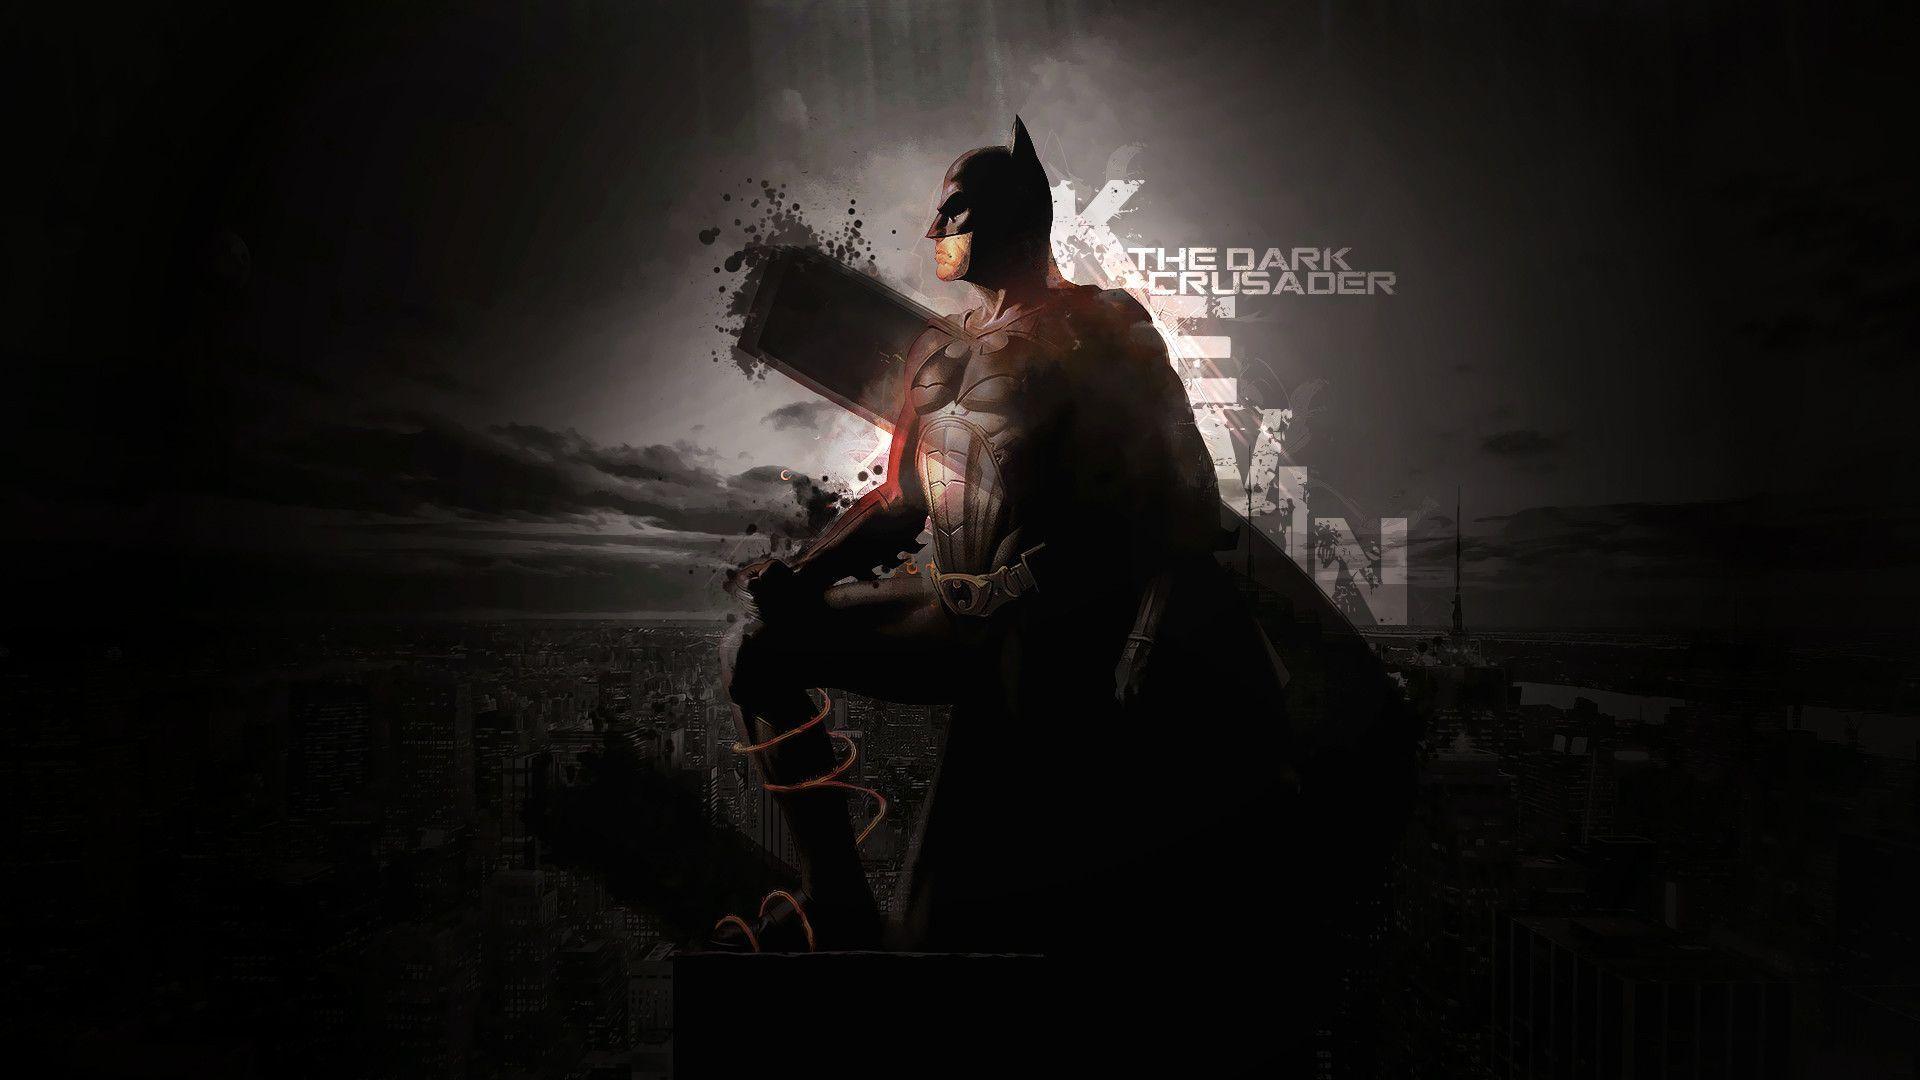 Batman Beyond HD Wallpapers Backgrounds Wallpaper   wallpapers   Batman wallpaper, Batman logo ...